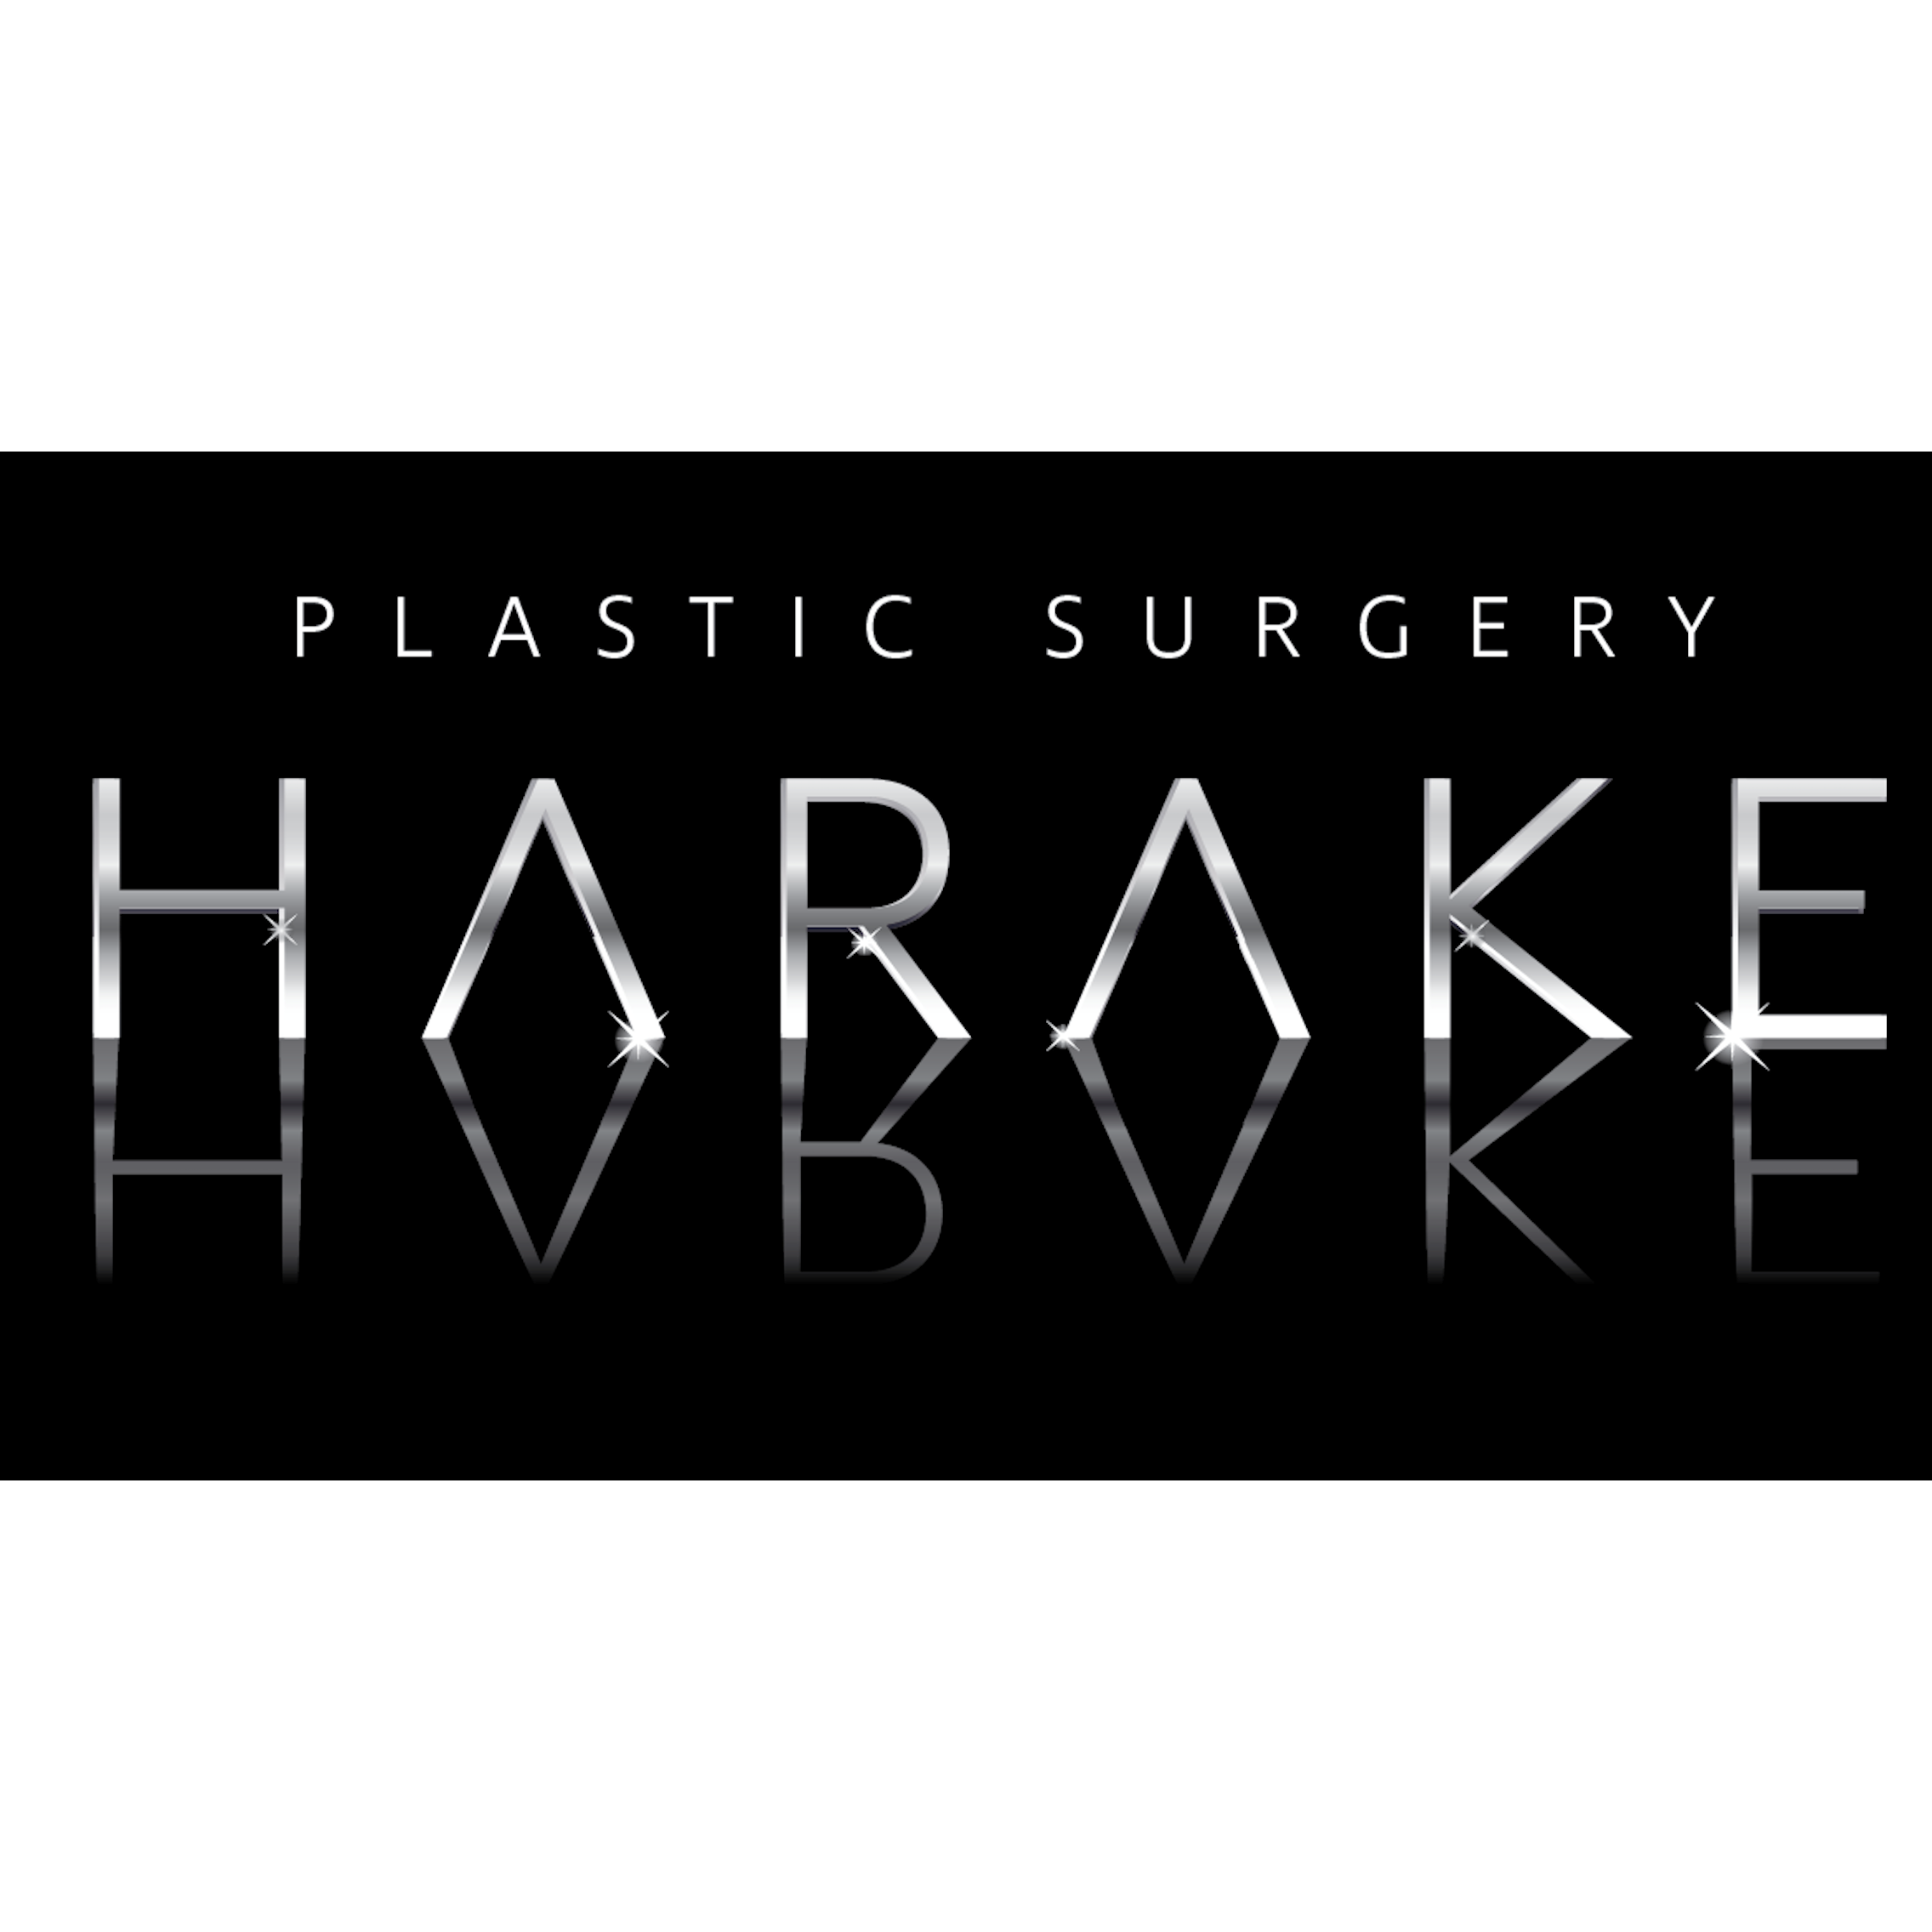 The Harake Institute